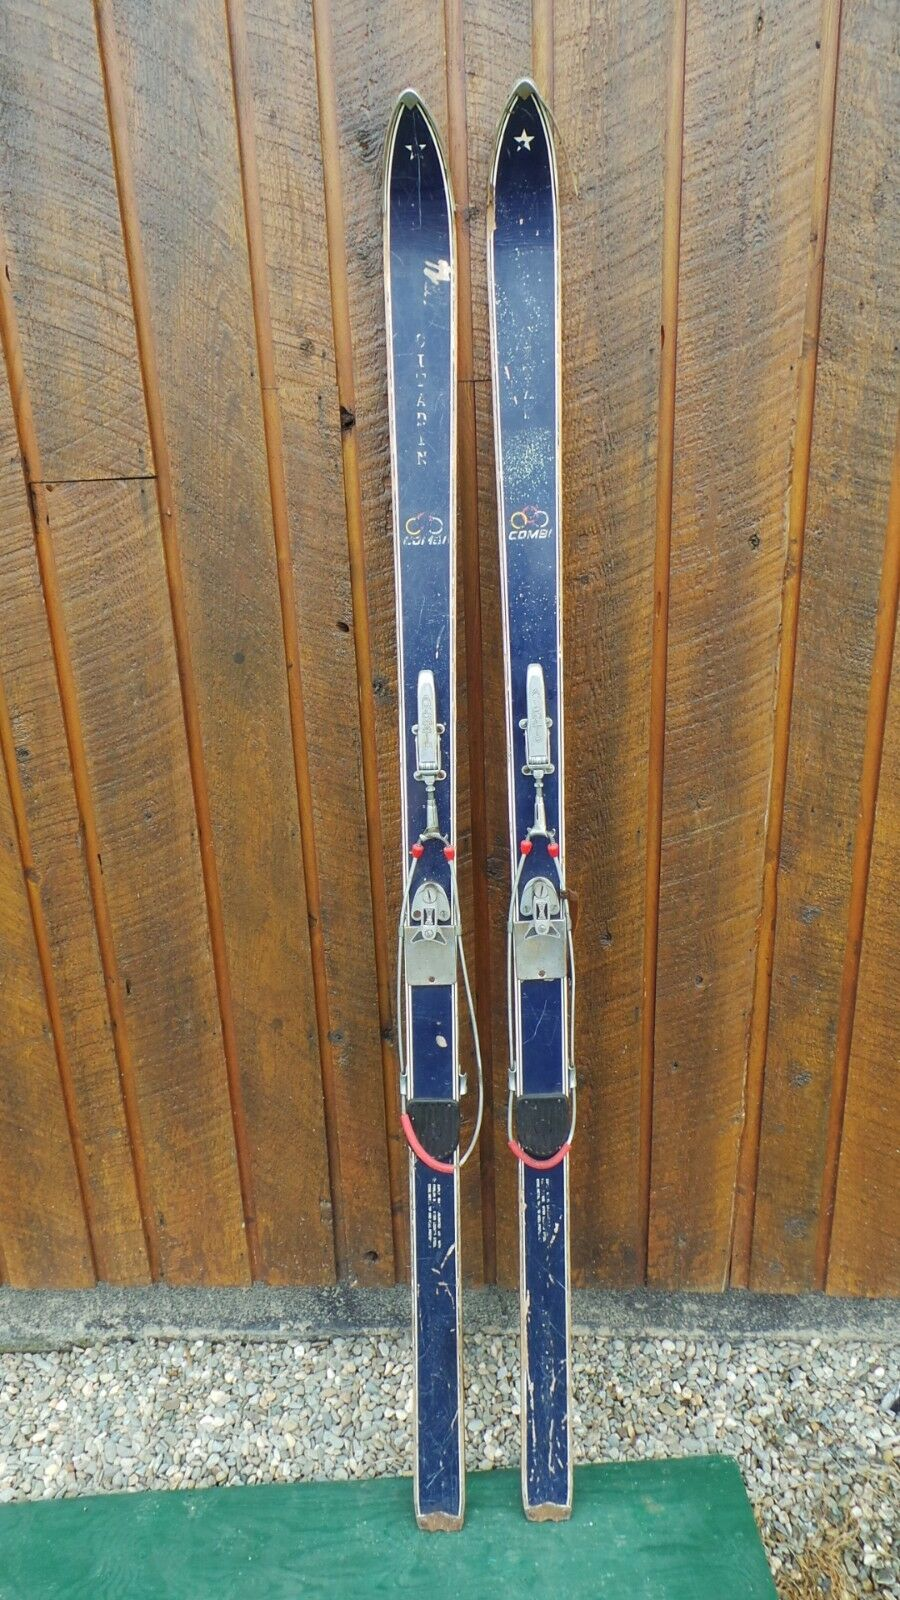 VINTAGE Wooden 70  Skis Original blueE Finish + Metal Cable Bindings